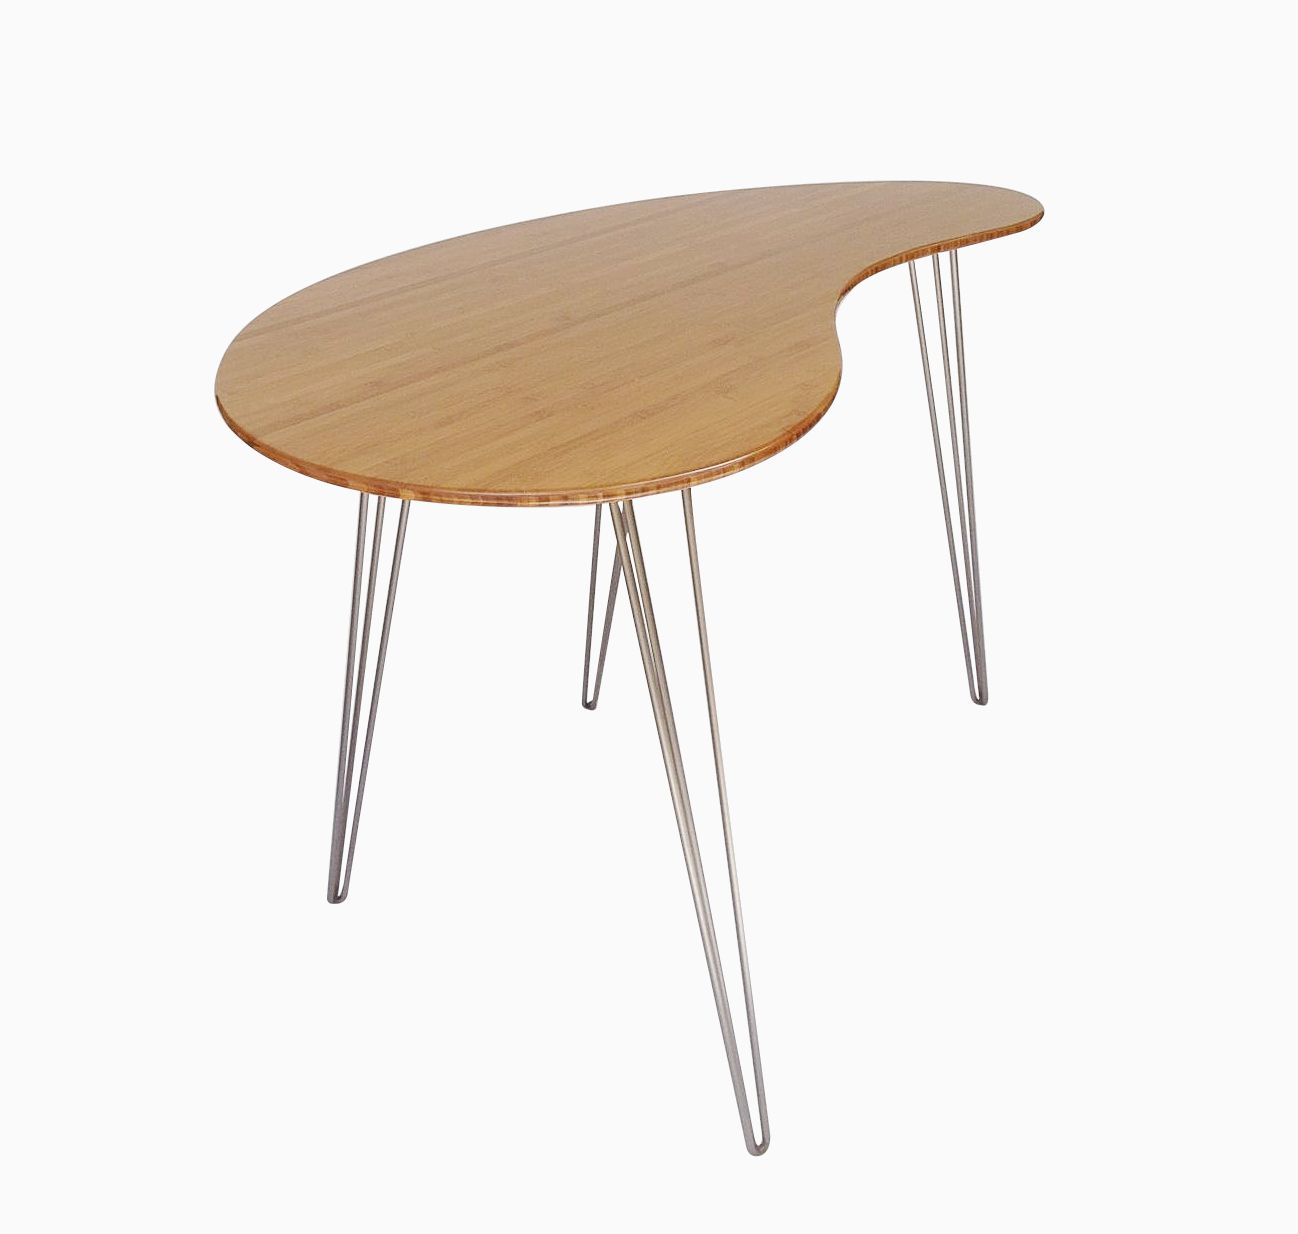 Custom Made Standing Desk, Kidney Shaped, Mid Century Modern